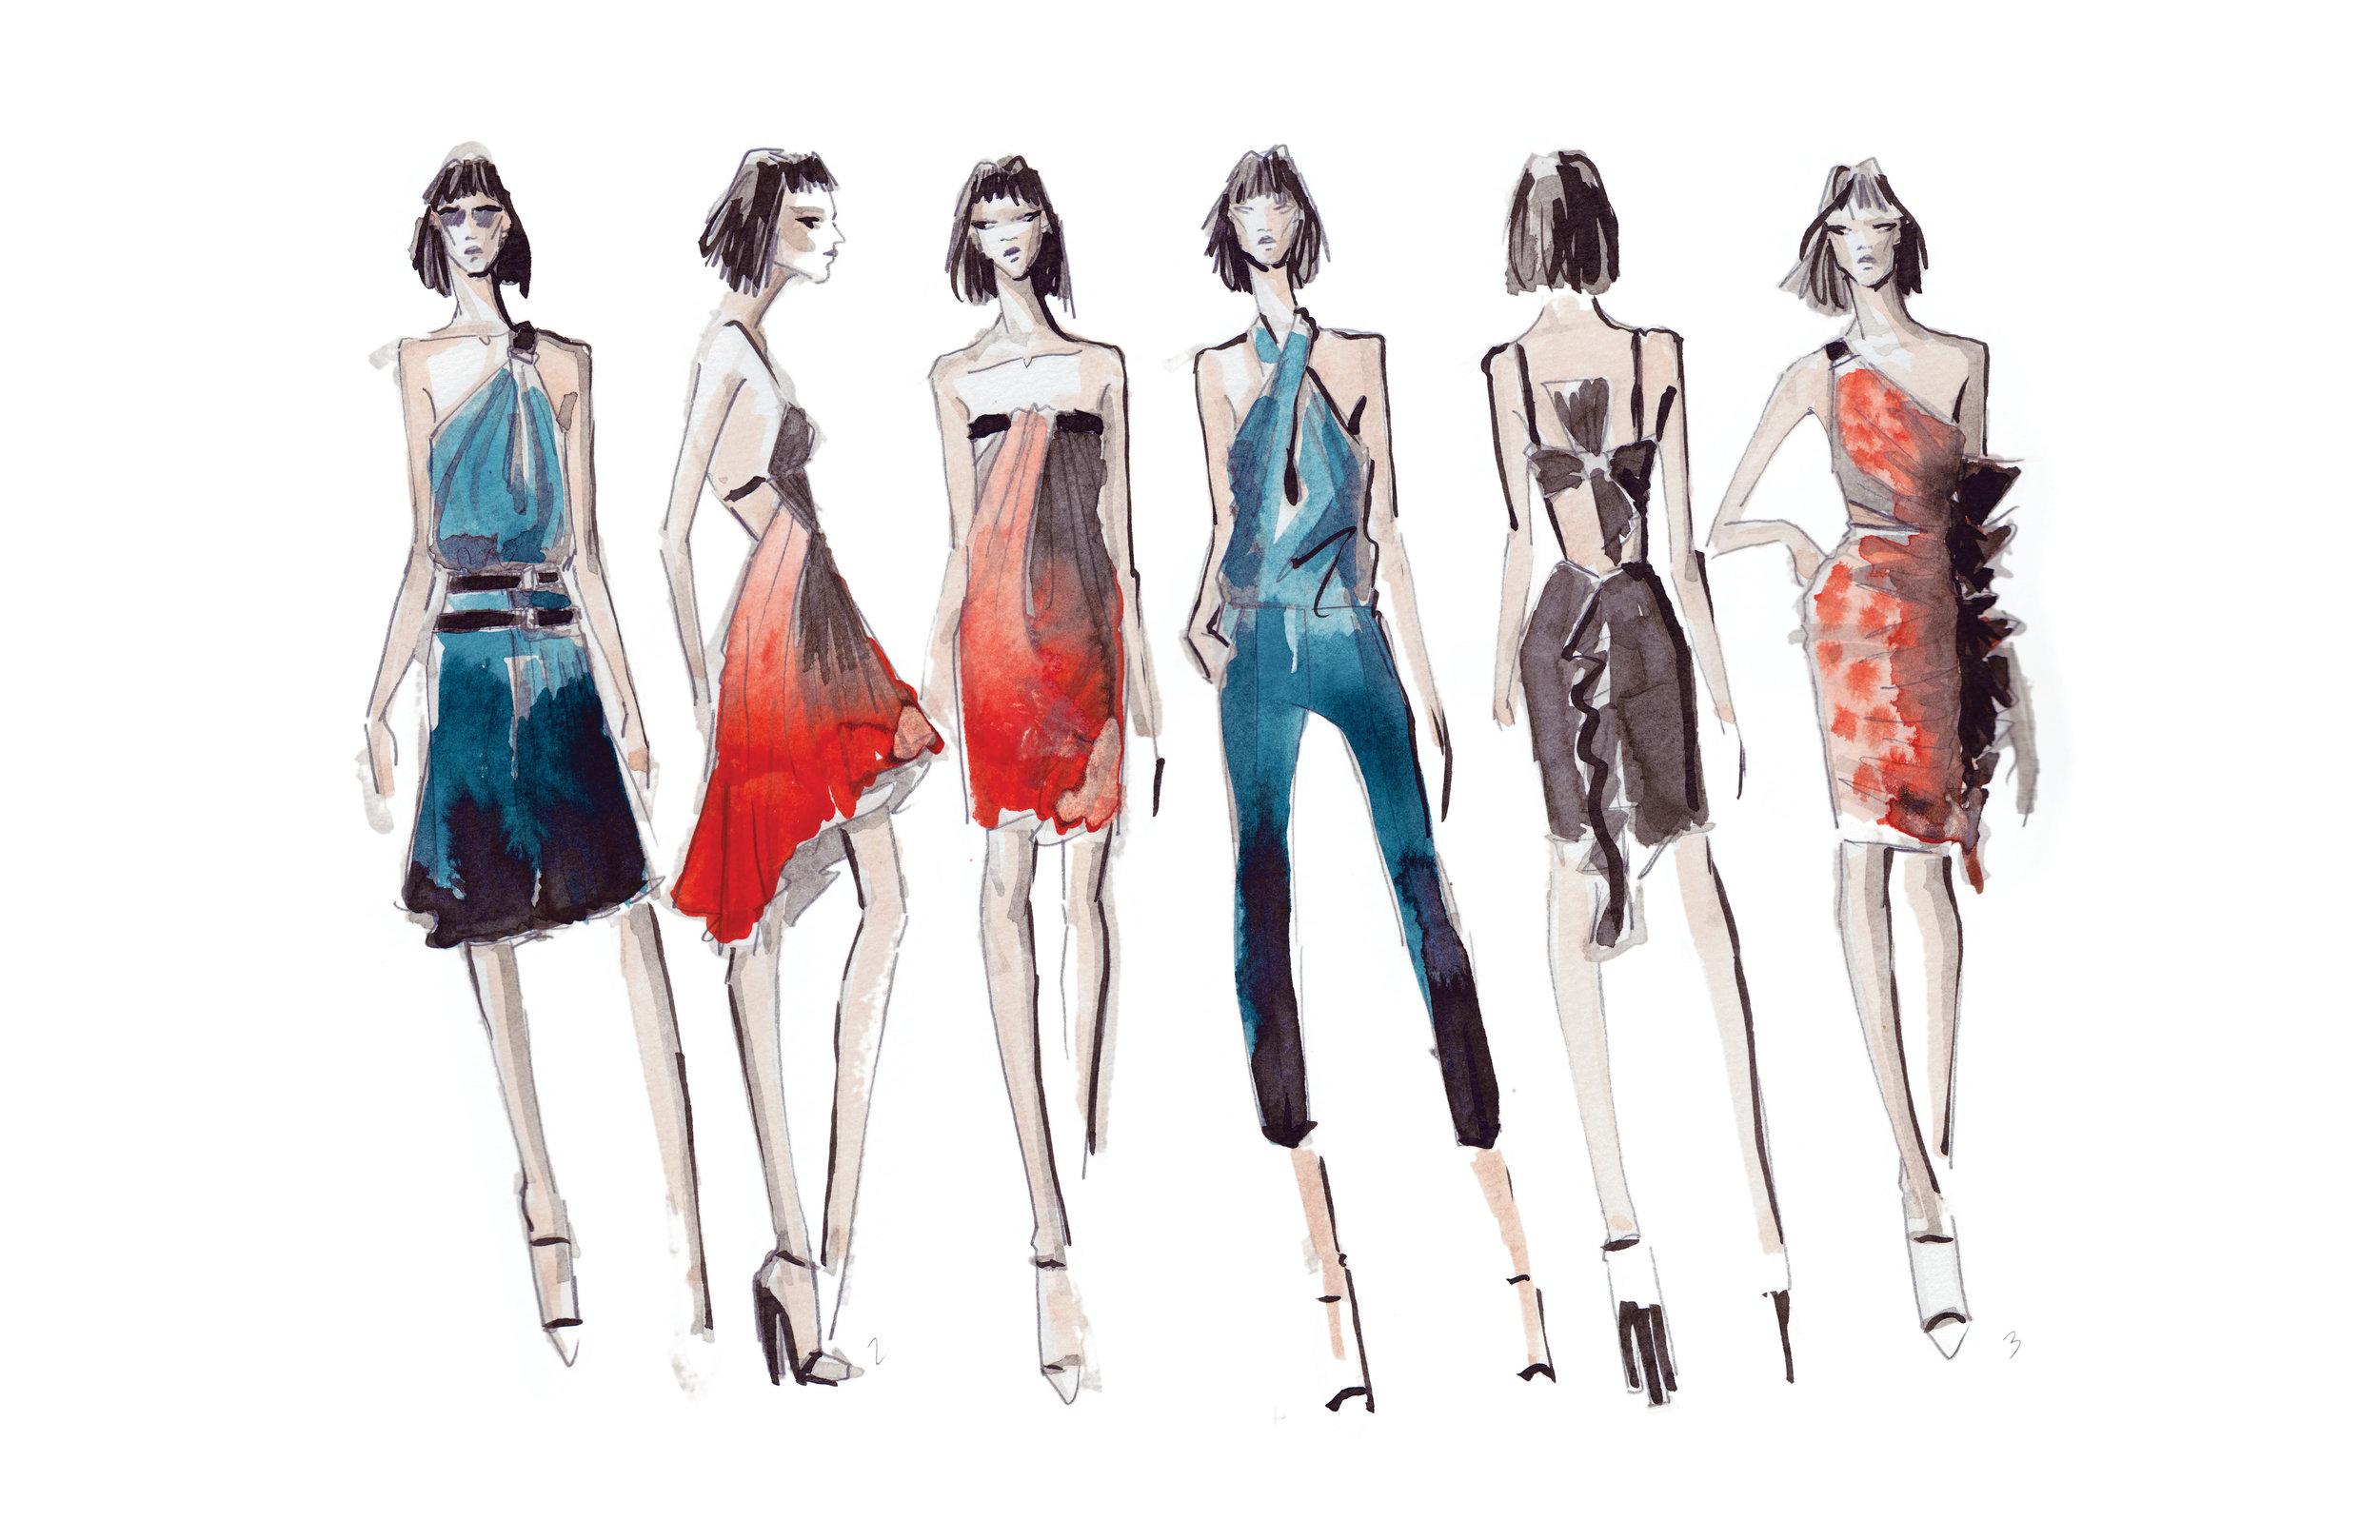 FREE PEOPLE DRESSES by DAVID FERRON9.jpg